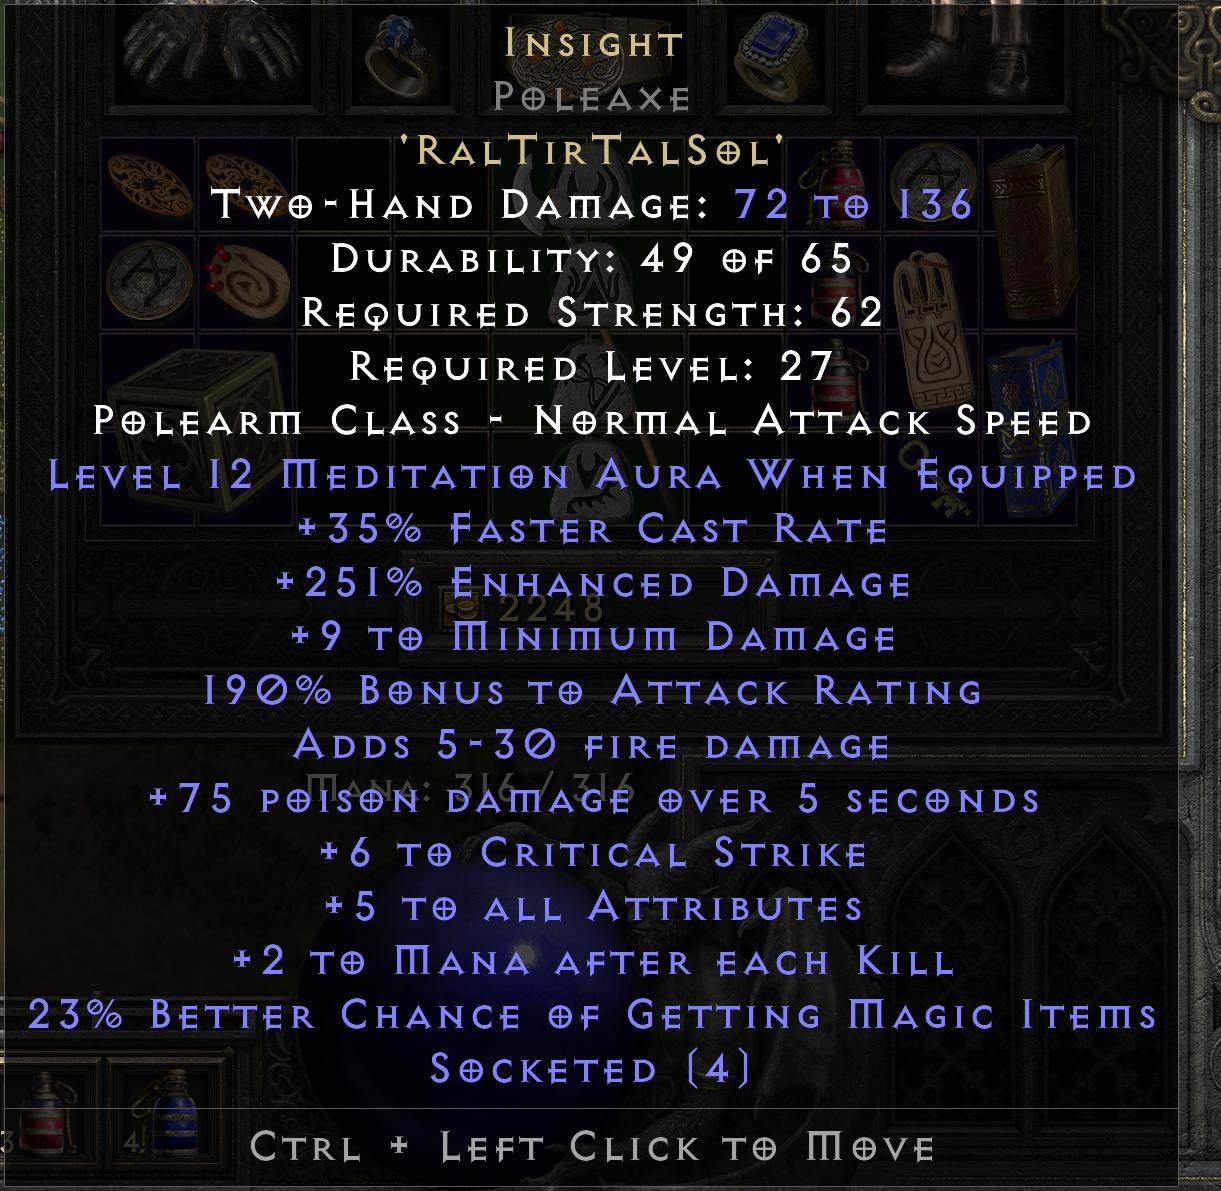 Insight - Poleaxe